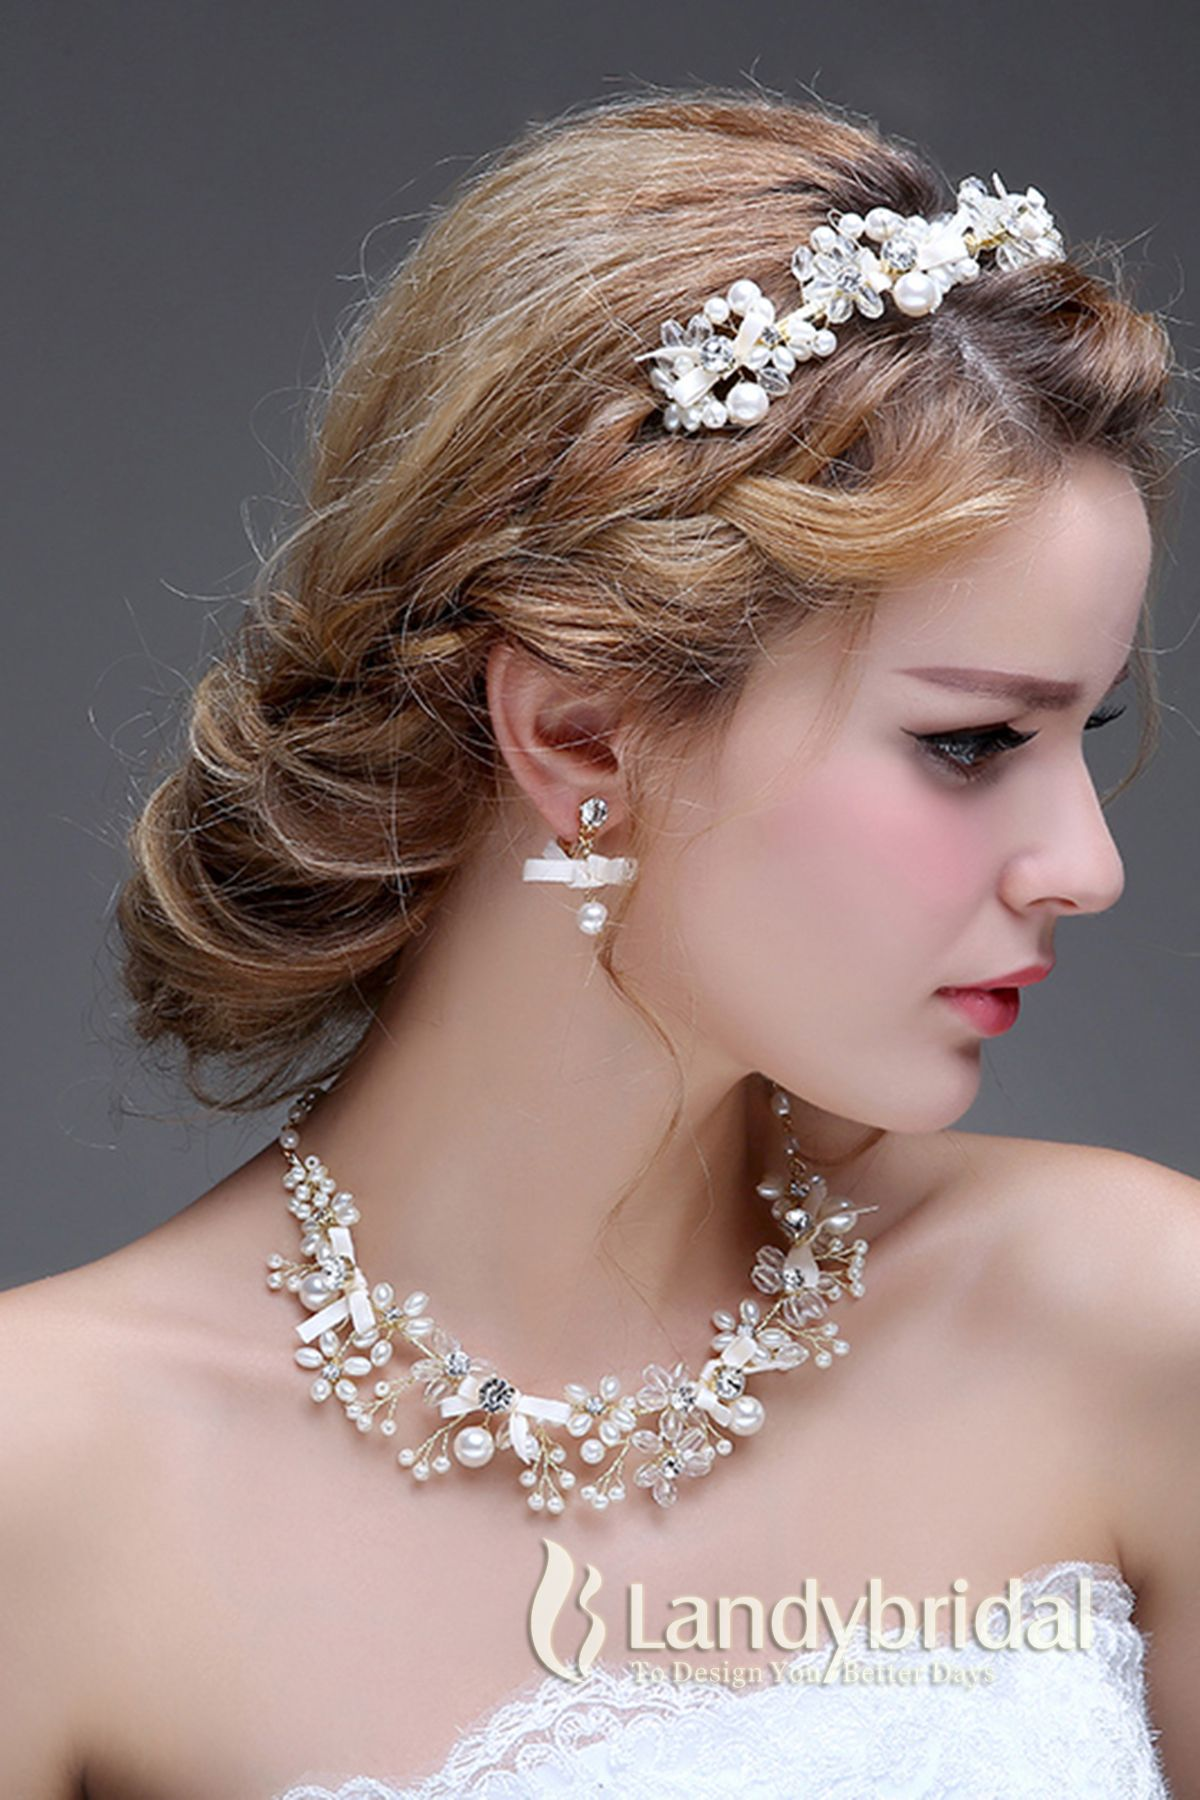 ad6e95a9bdd55 アクセサリー ティアラ イヤリング ネックレス 自然風 繊細なデザイン ウェディング小物 結婚式 花嫁 JJ001500E 税込  ¥10